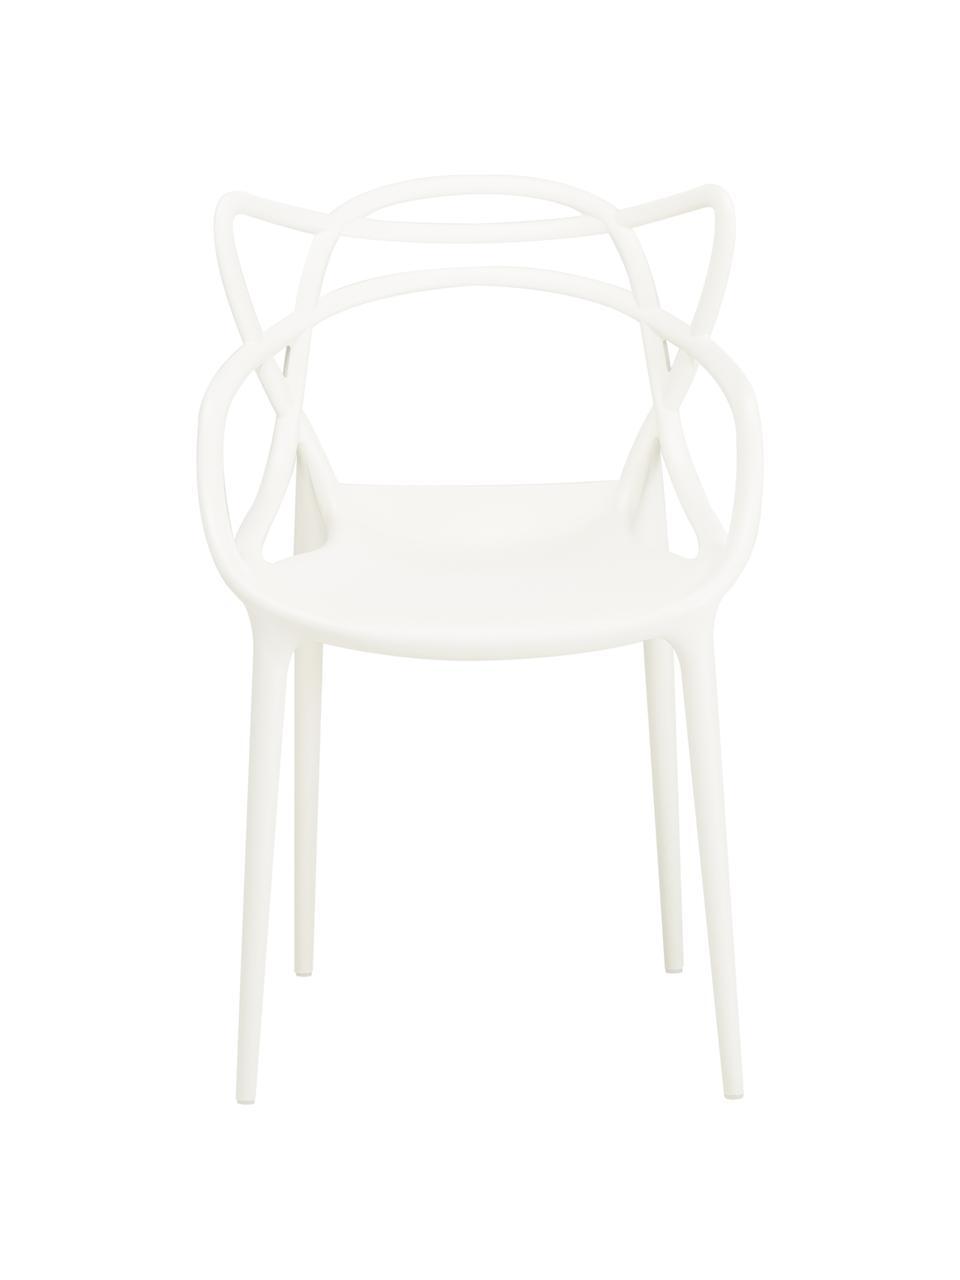 Sedie con braccioli impilabile Masters 2 pz, Polipropilene, Bianco, Larg. 57 x Alt. 84 cm